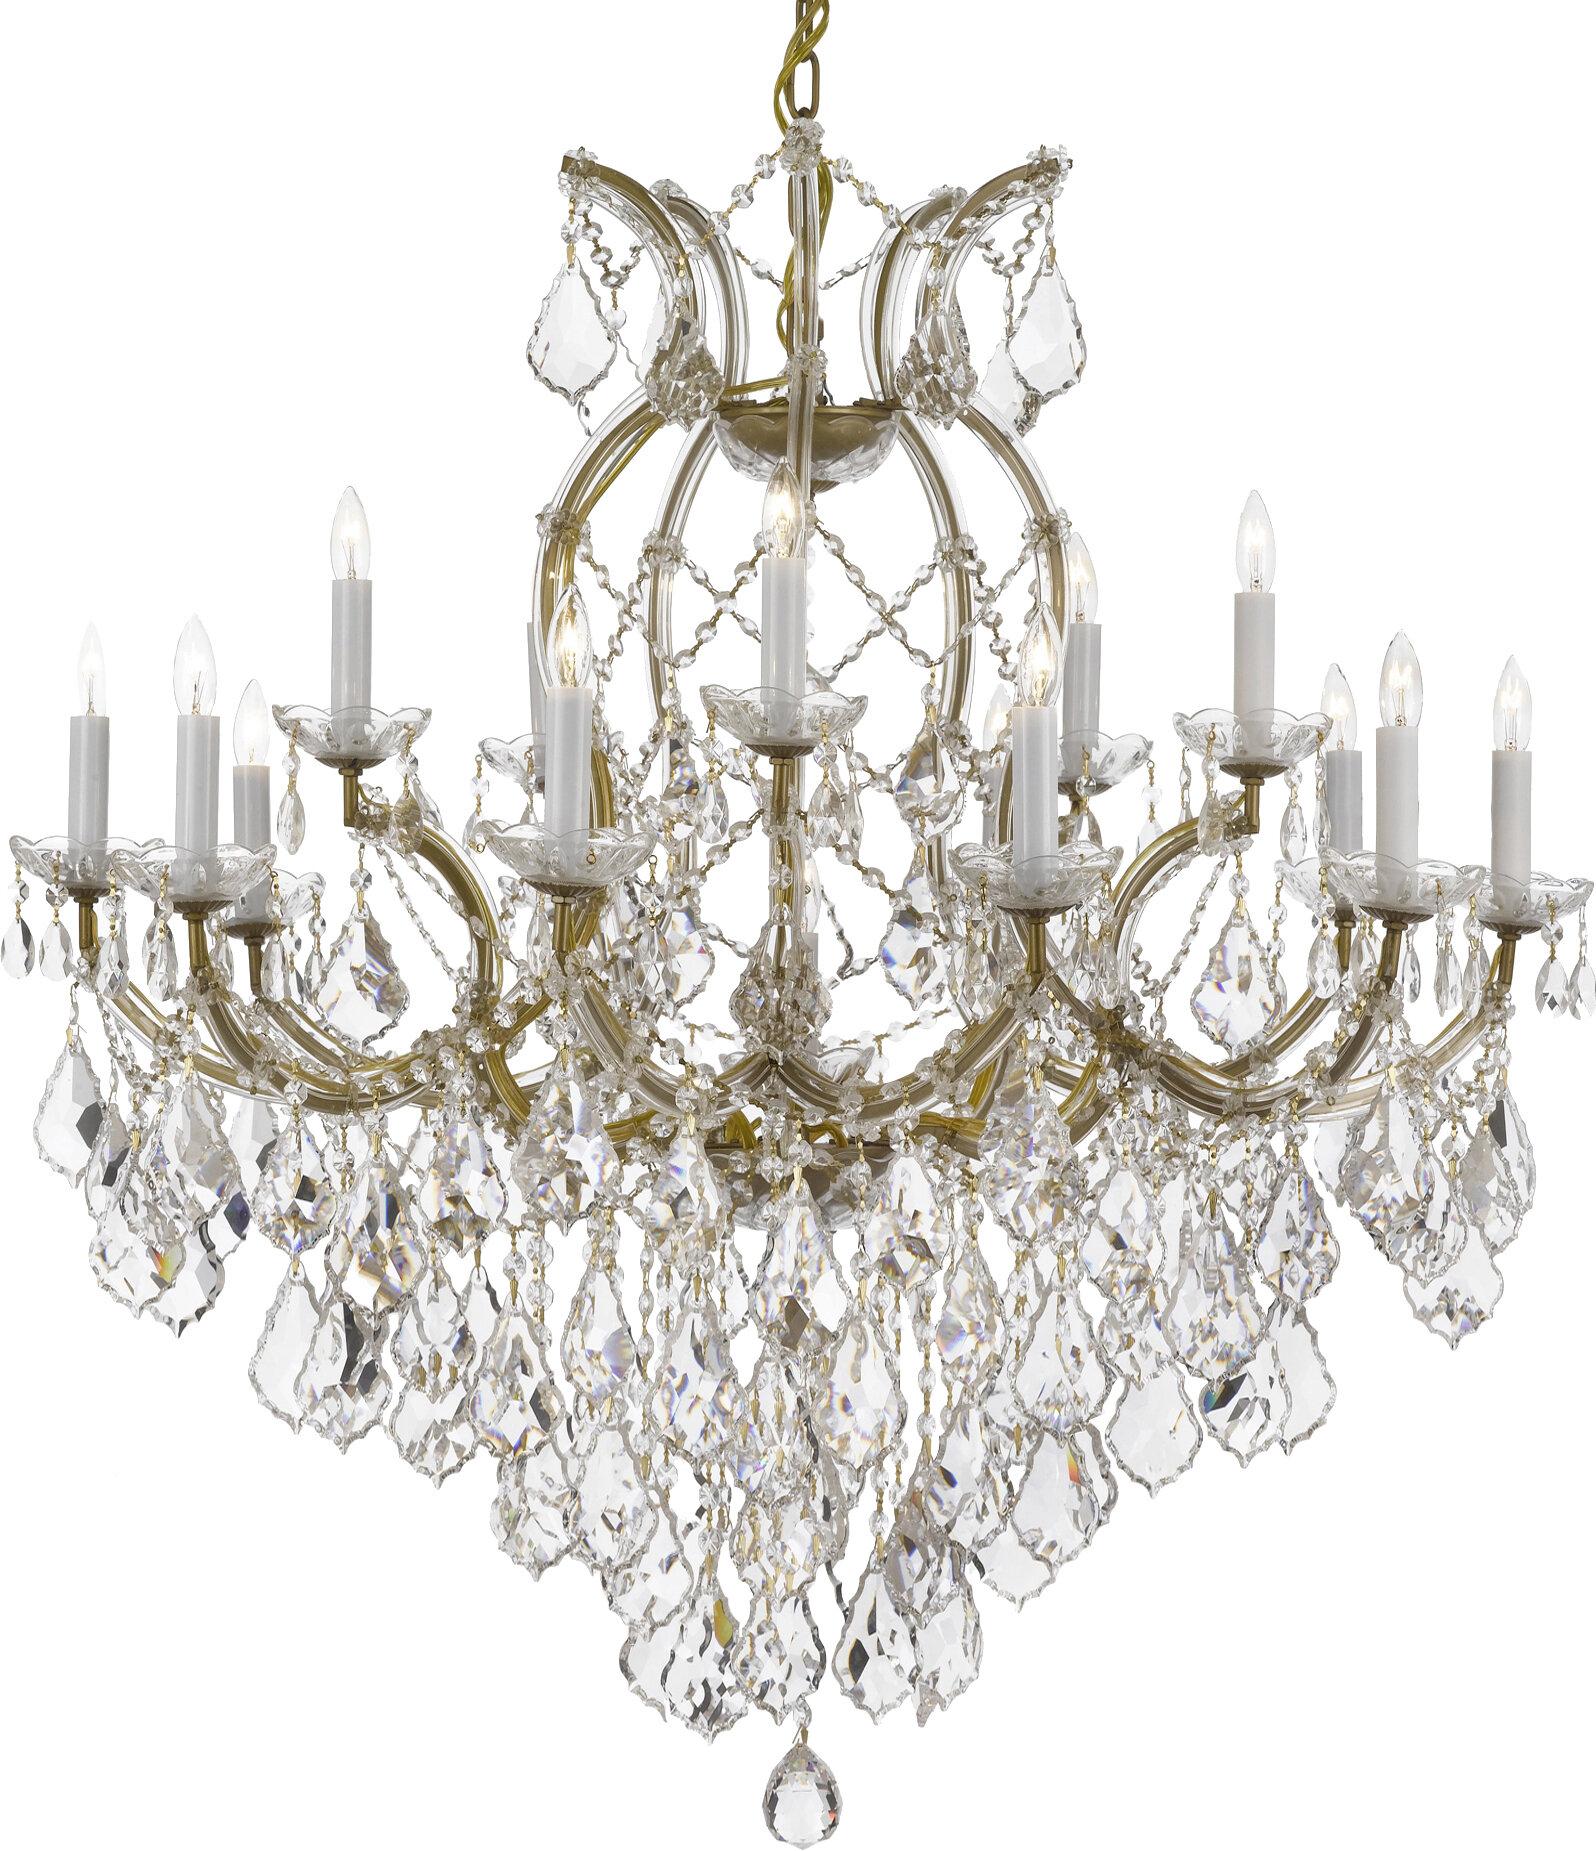 Rosdorf Park Brooksland 16 Light Candle Style Chandelier Reviews Wayfair